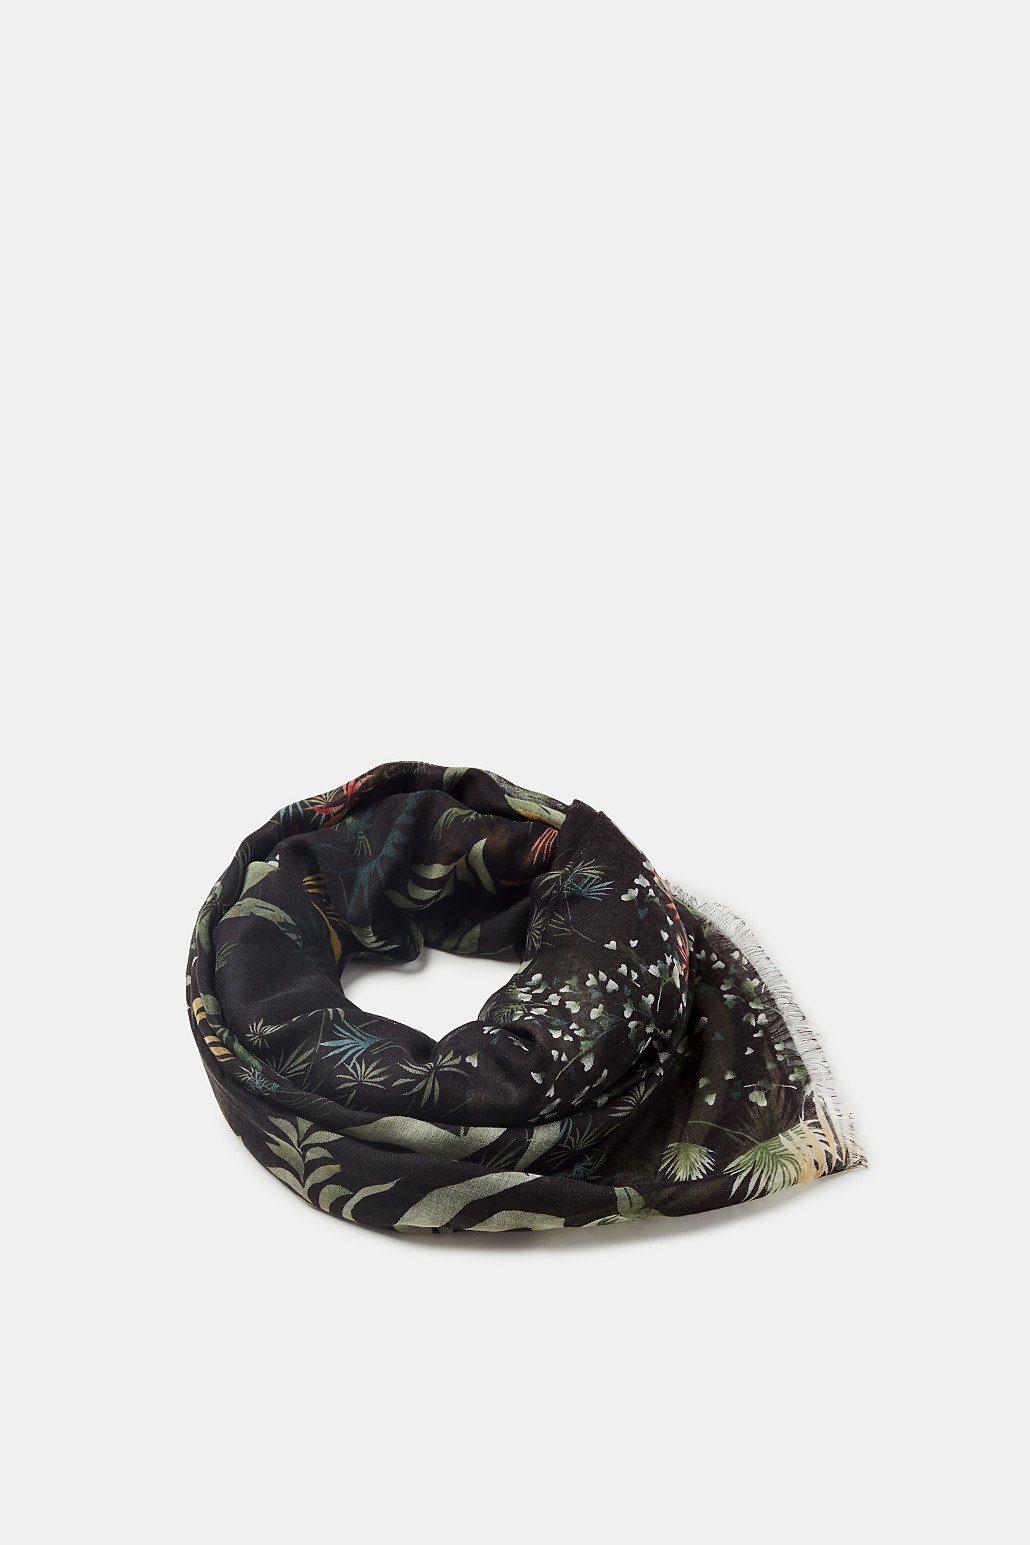 ESPRIT Transparenter Web-Schal mit Botanik-Print